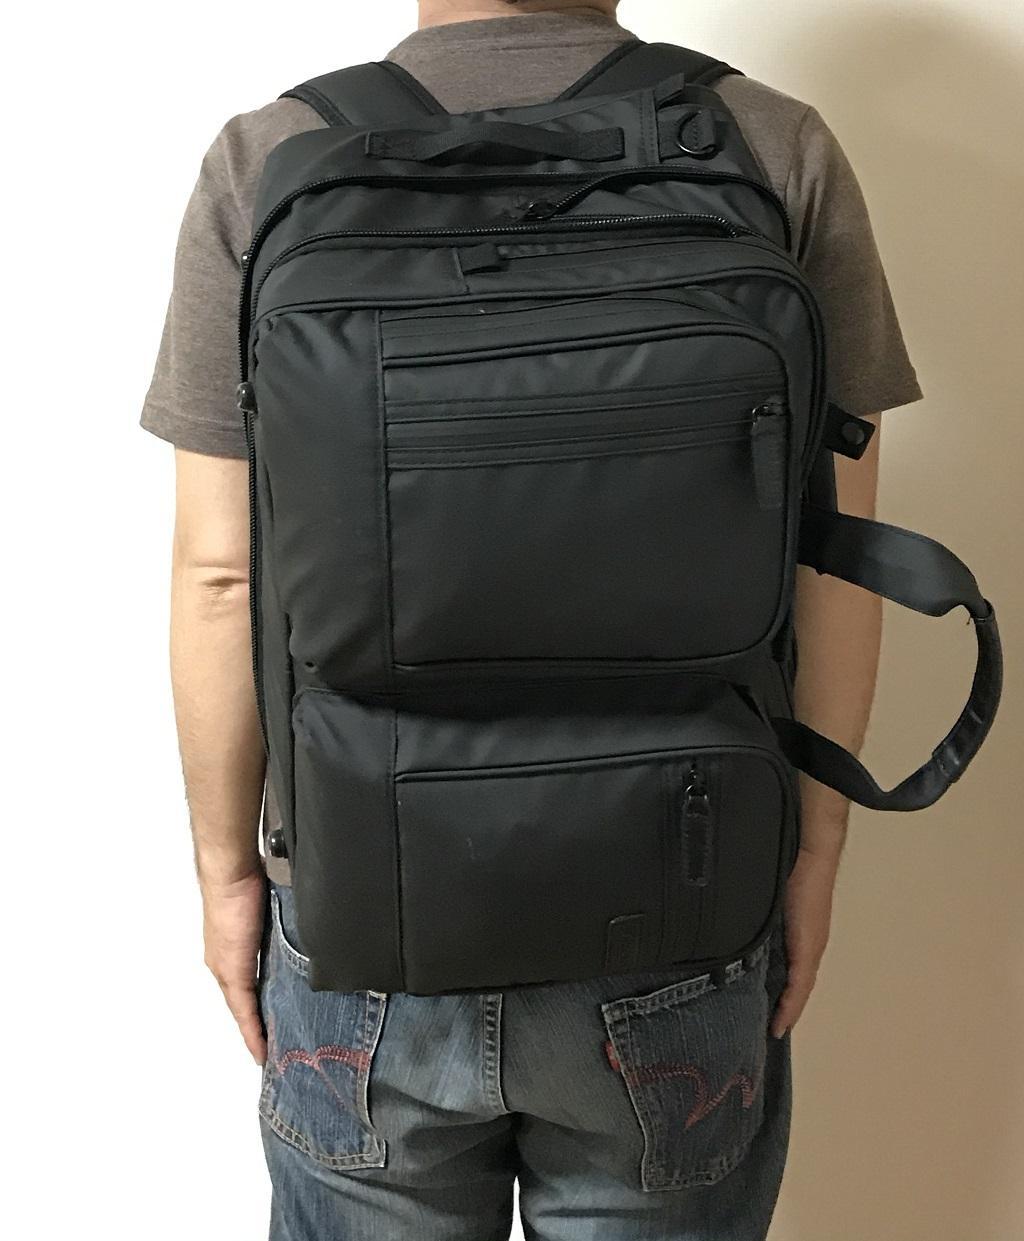 VORQITの防水ビジネスバッグをリュックとして背負った様子(後ろから見た様子)